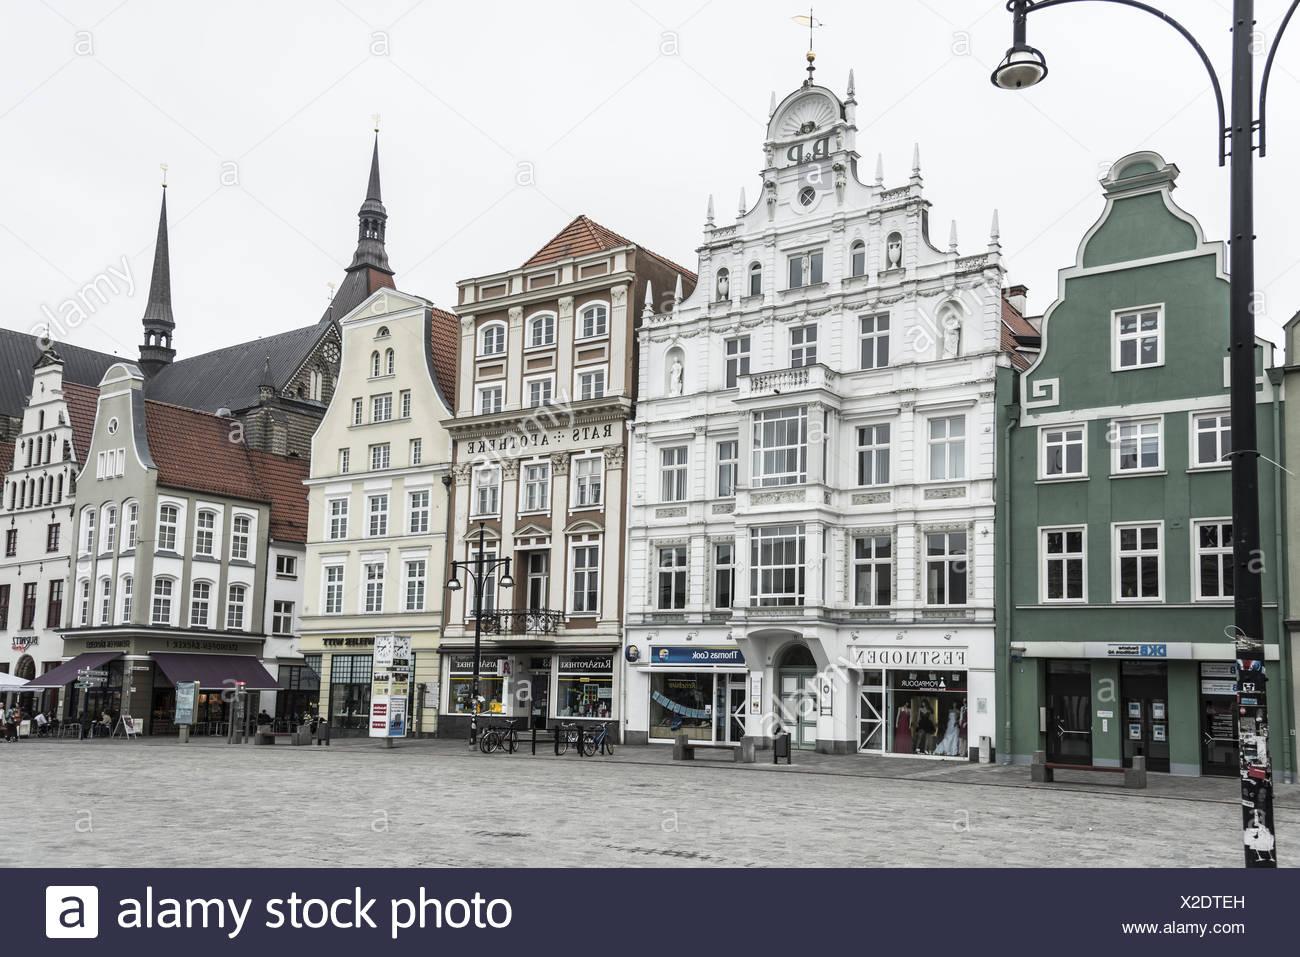 New market, Rostock - Stock Image